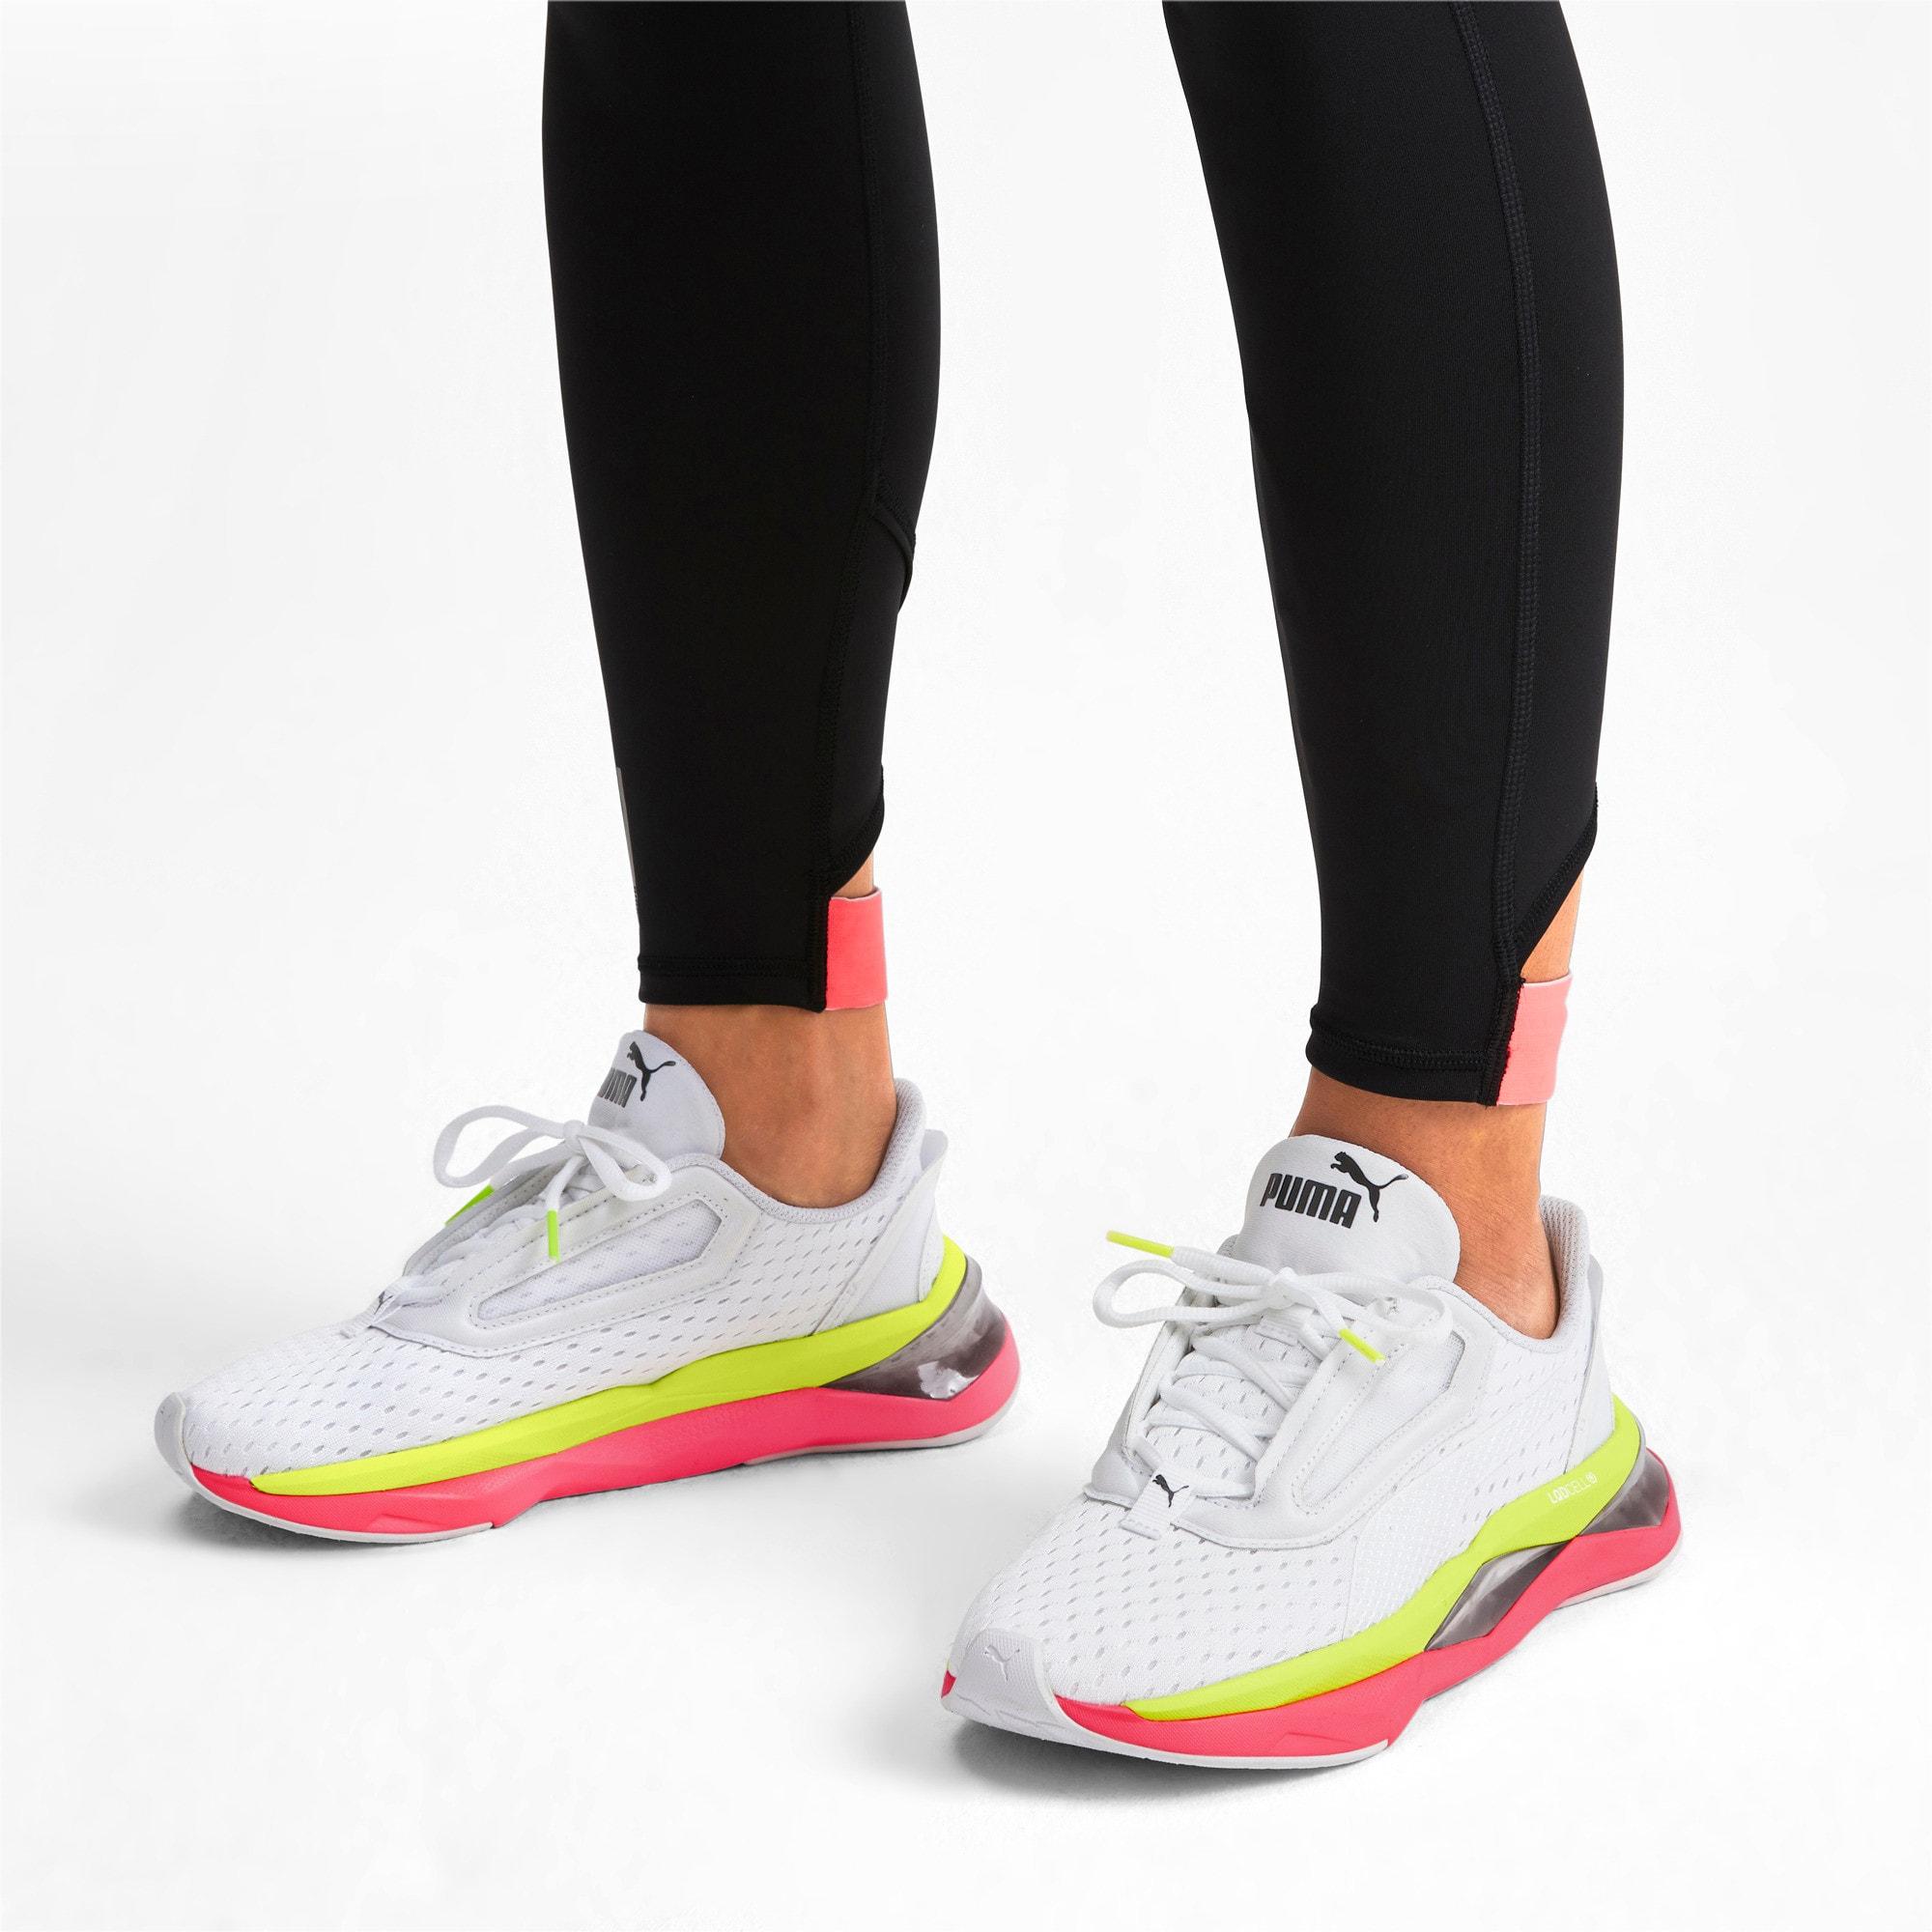 Thumbnail 2 of LQDCell Shatter XT Women's Training Shoes, Puma White-Pink Alert, medium-IND